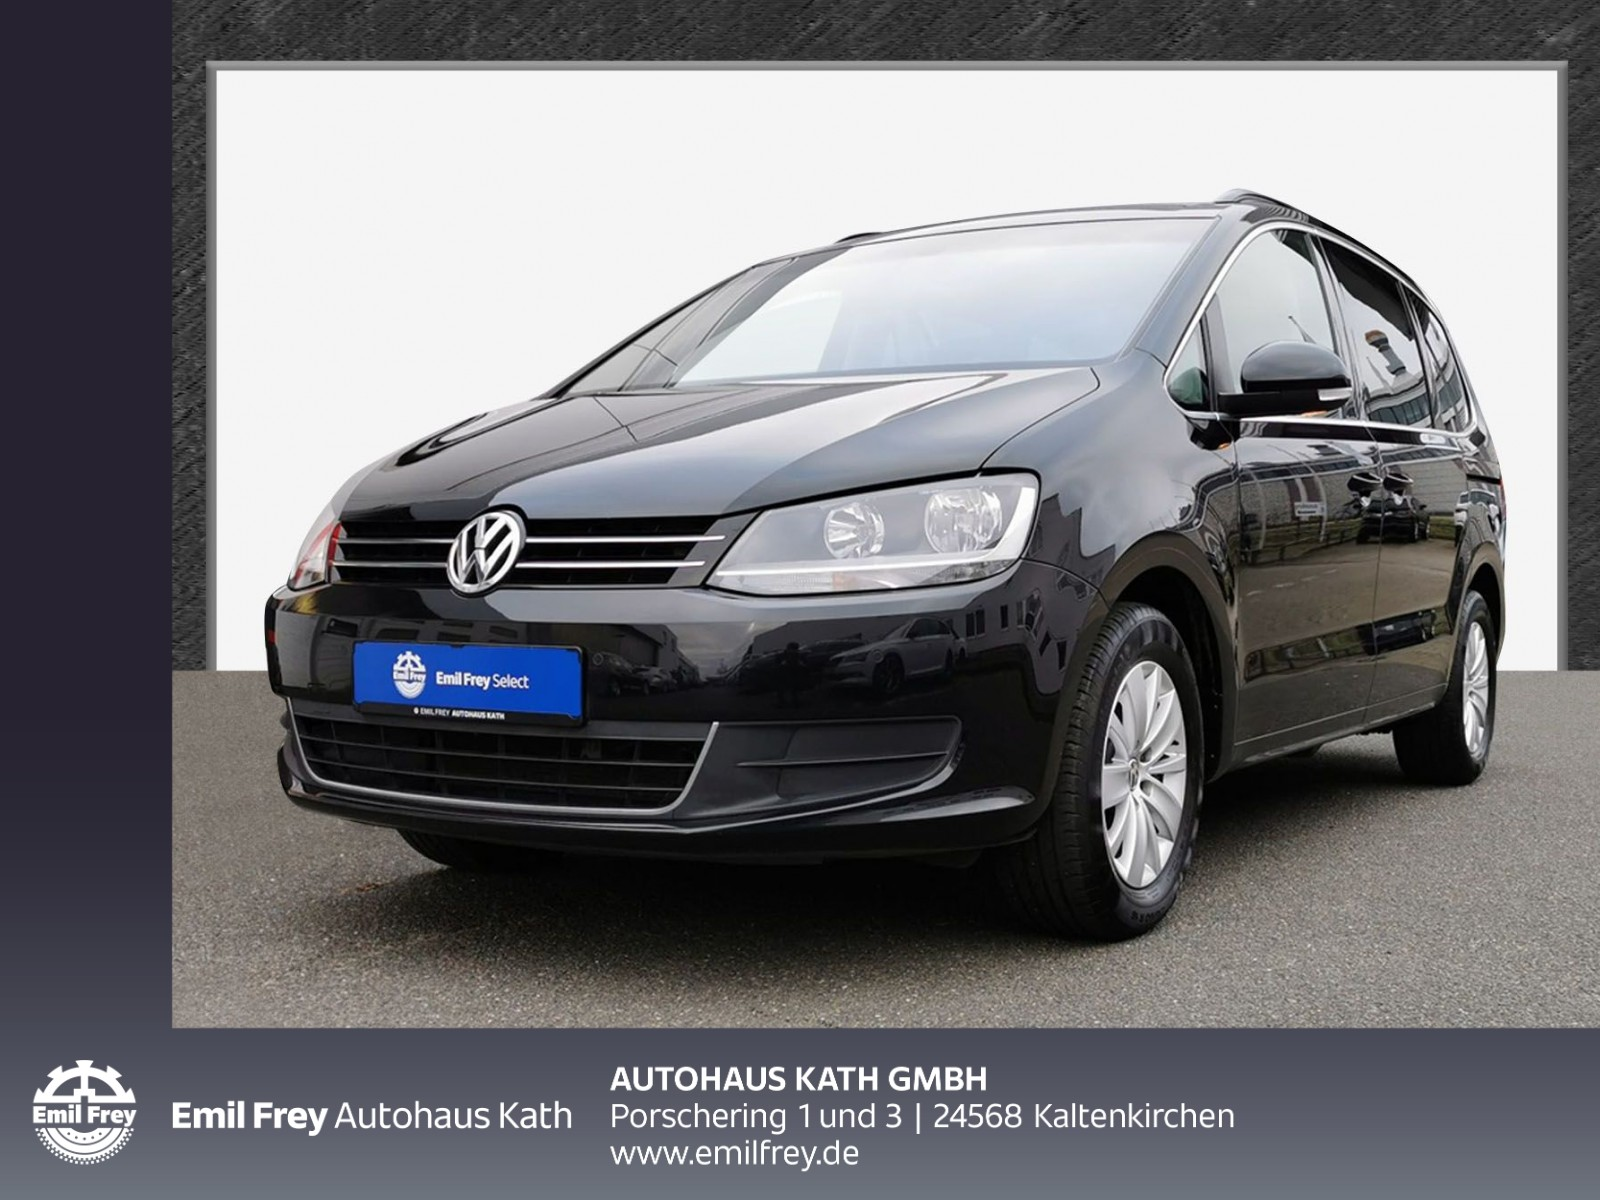 Volkswagen Sharan 2.0 TDI DSG BMT Comfortline AHK Navi Kamera, Jahr 2015, Diesel